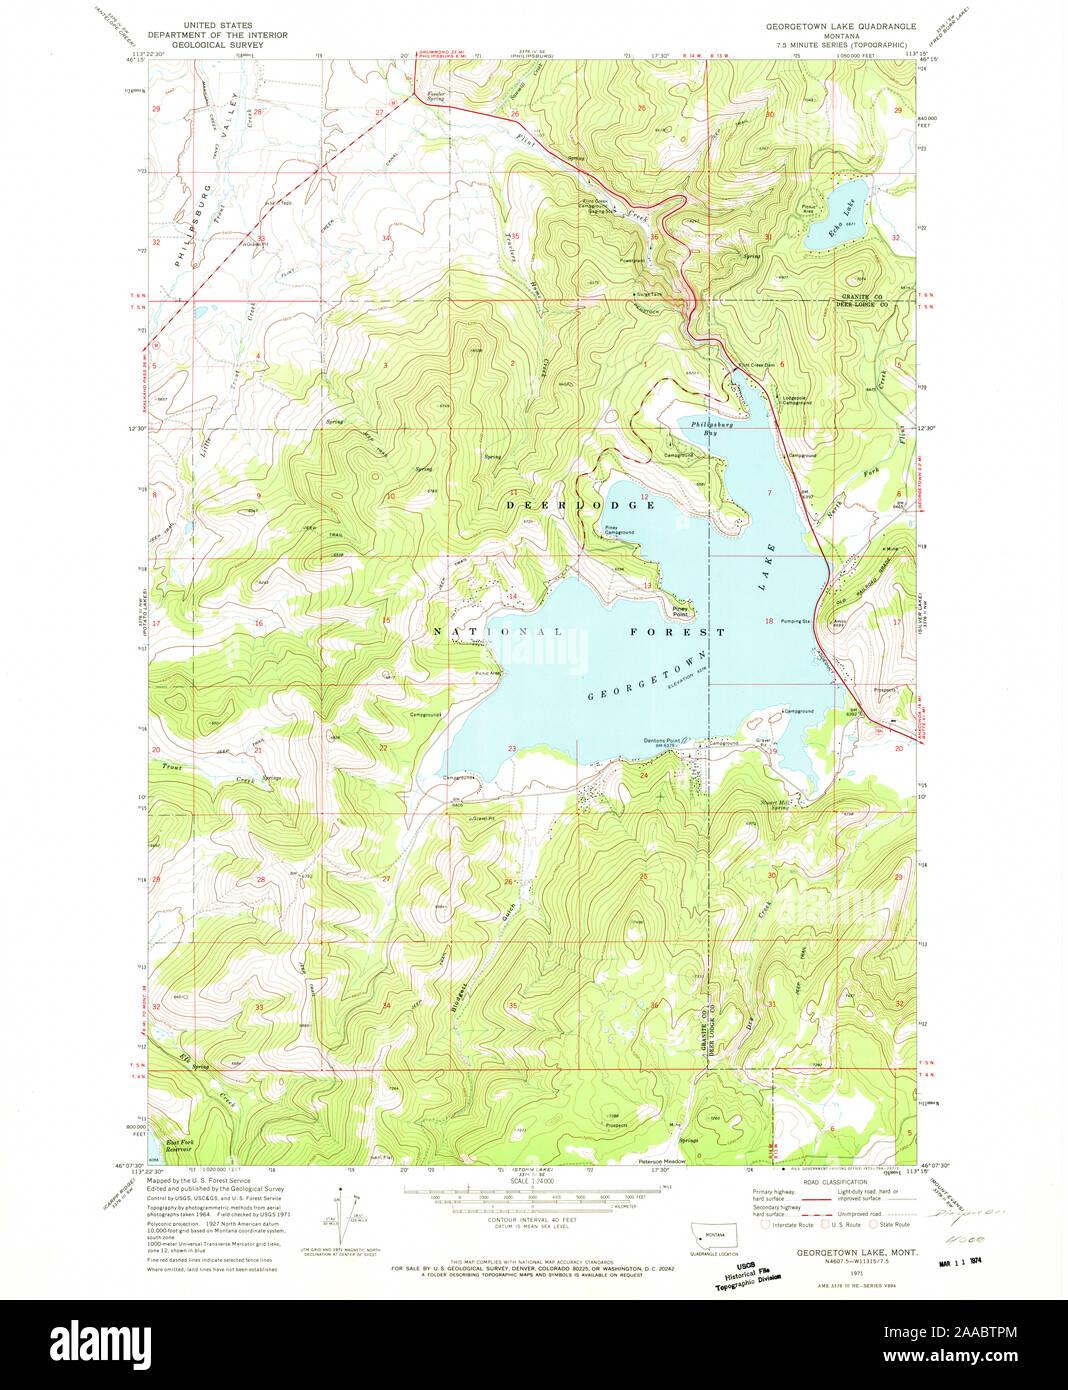 georgetown lake mt map Usgs Topo Map Montana Mt Georgetown Lake 264002 1971 24000 georgetown lake mt map